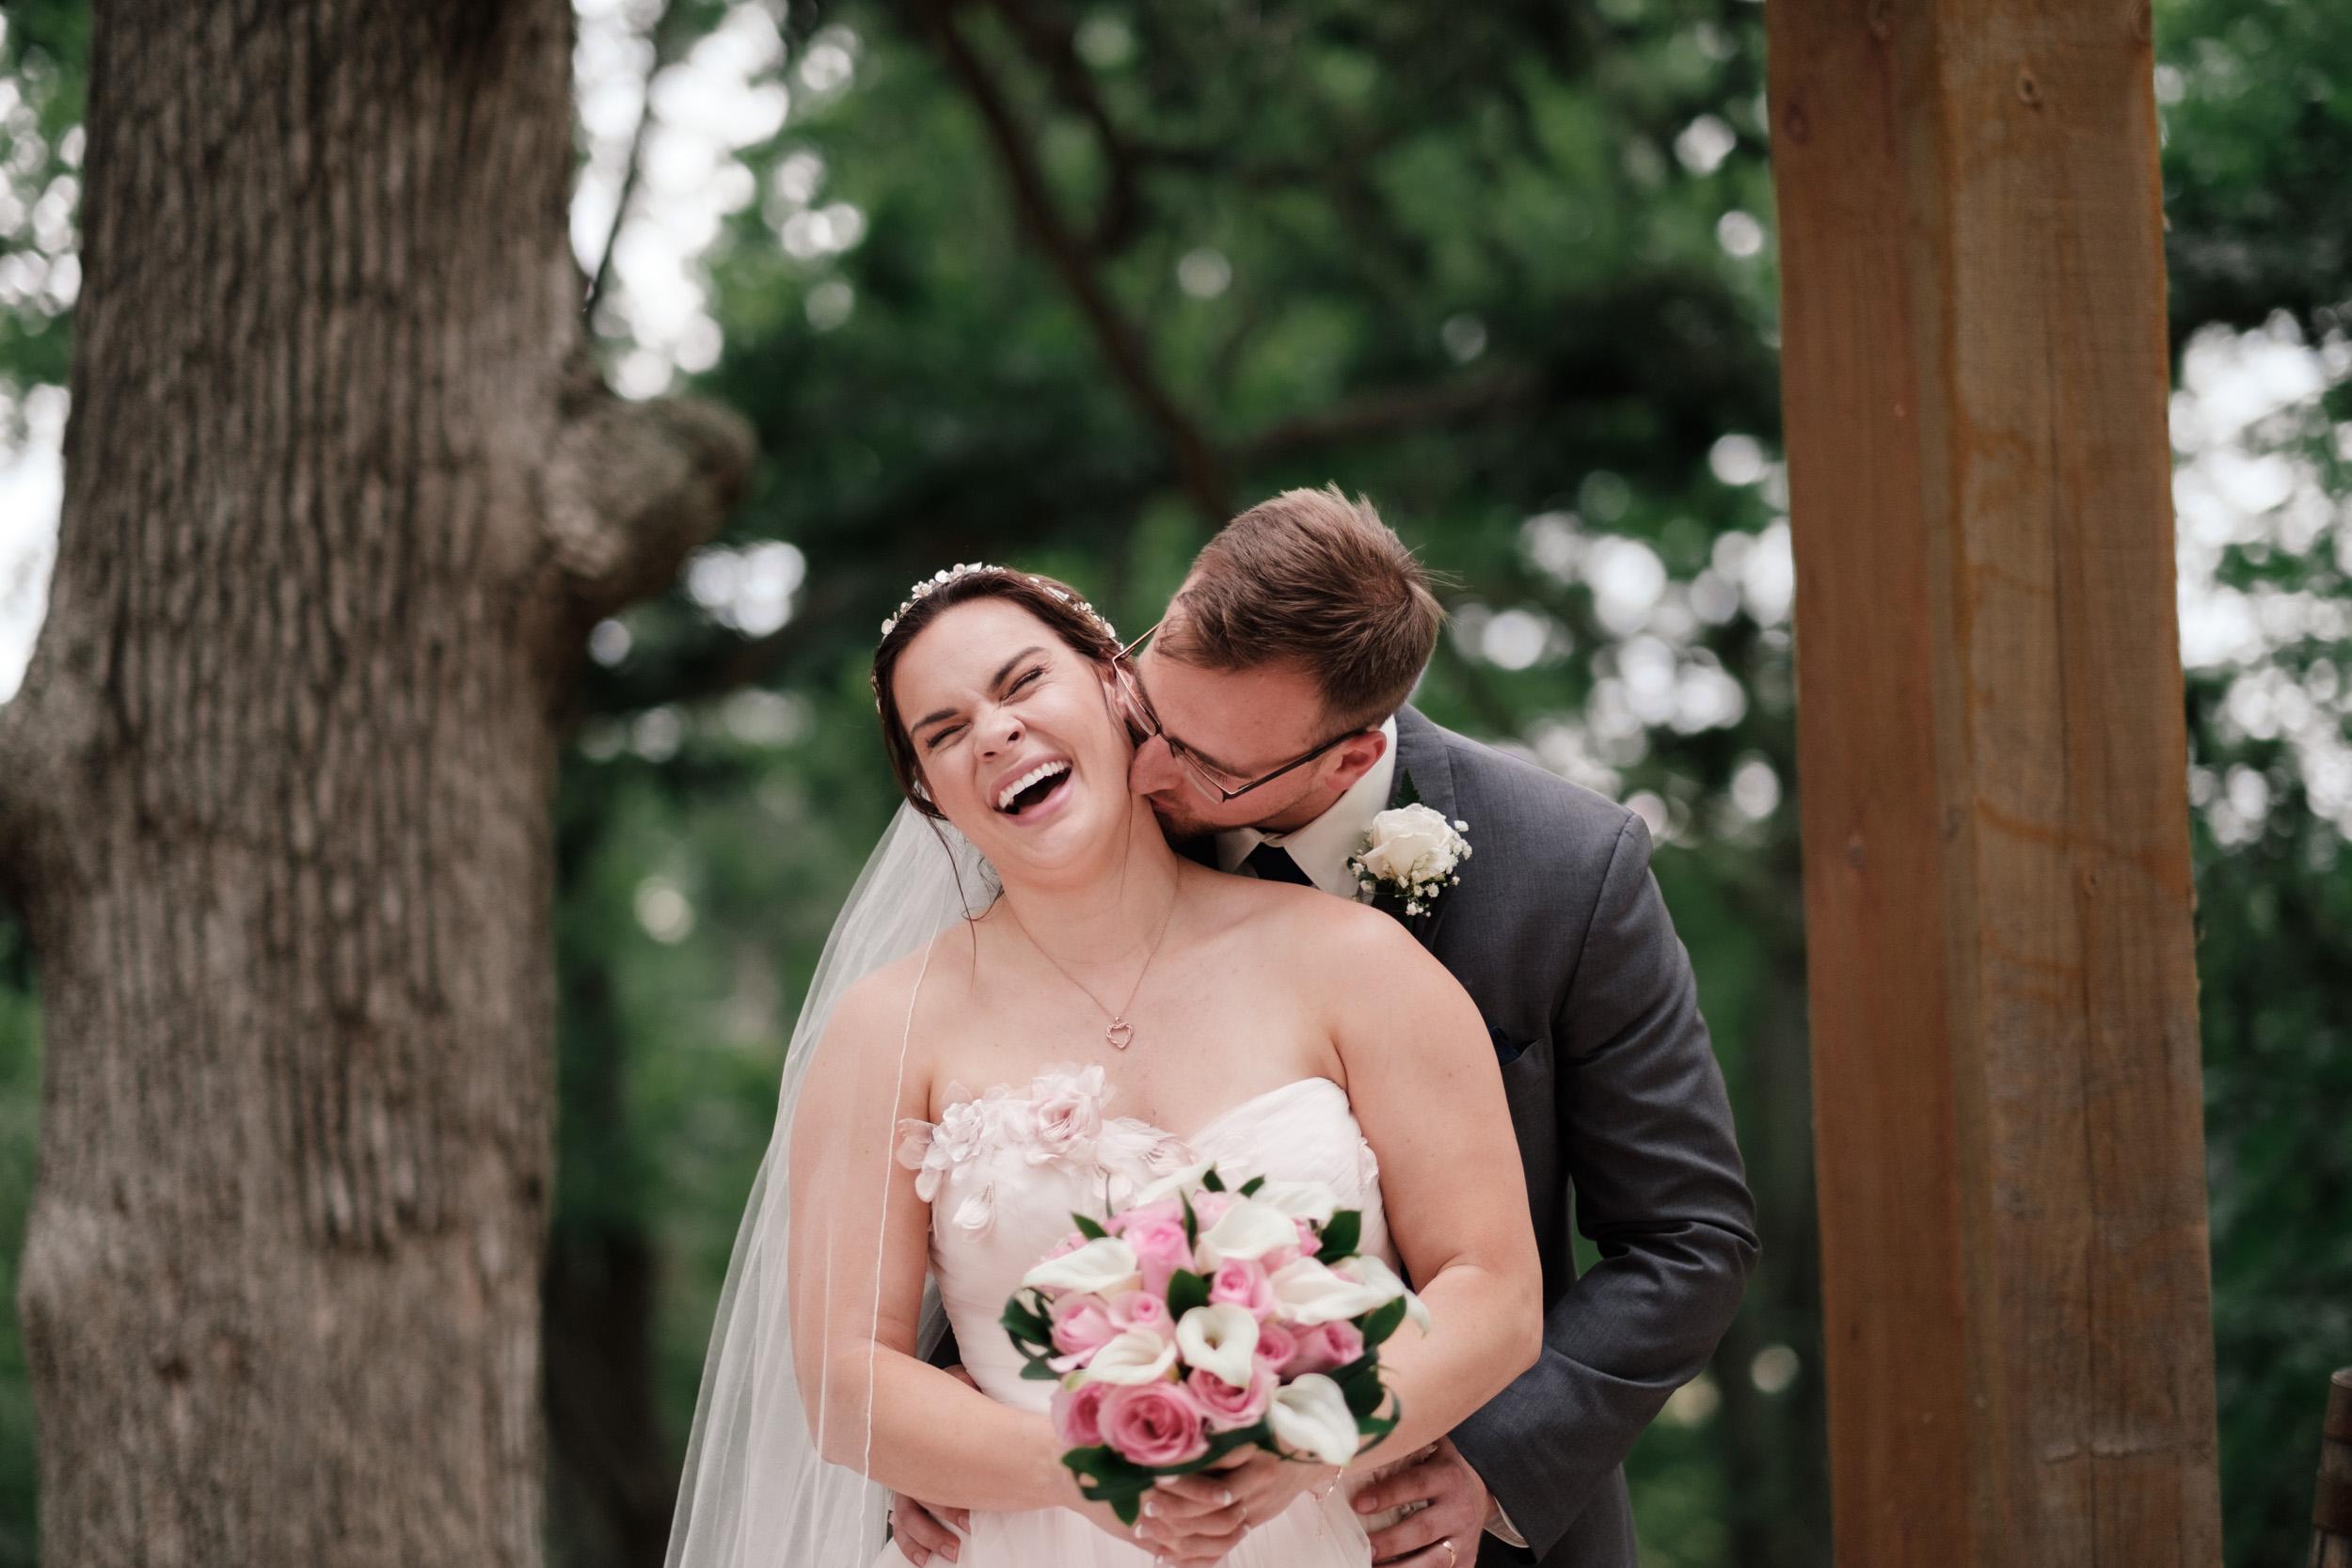 19-06-22-Ryan-Katie-The-Fields-Reserve-Wedding-45.jpg